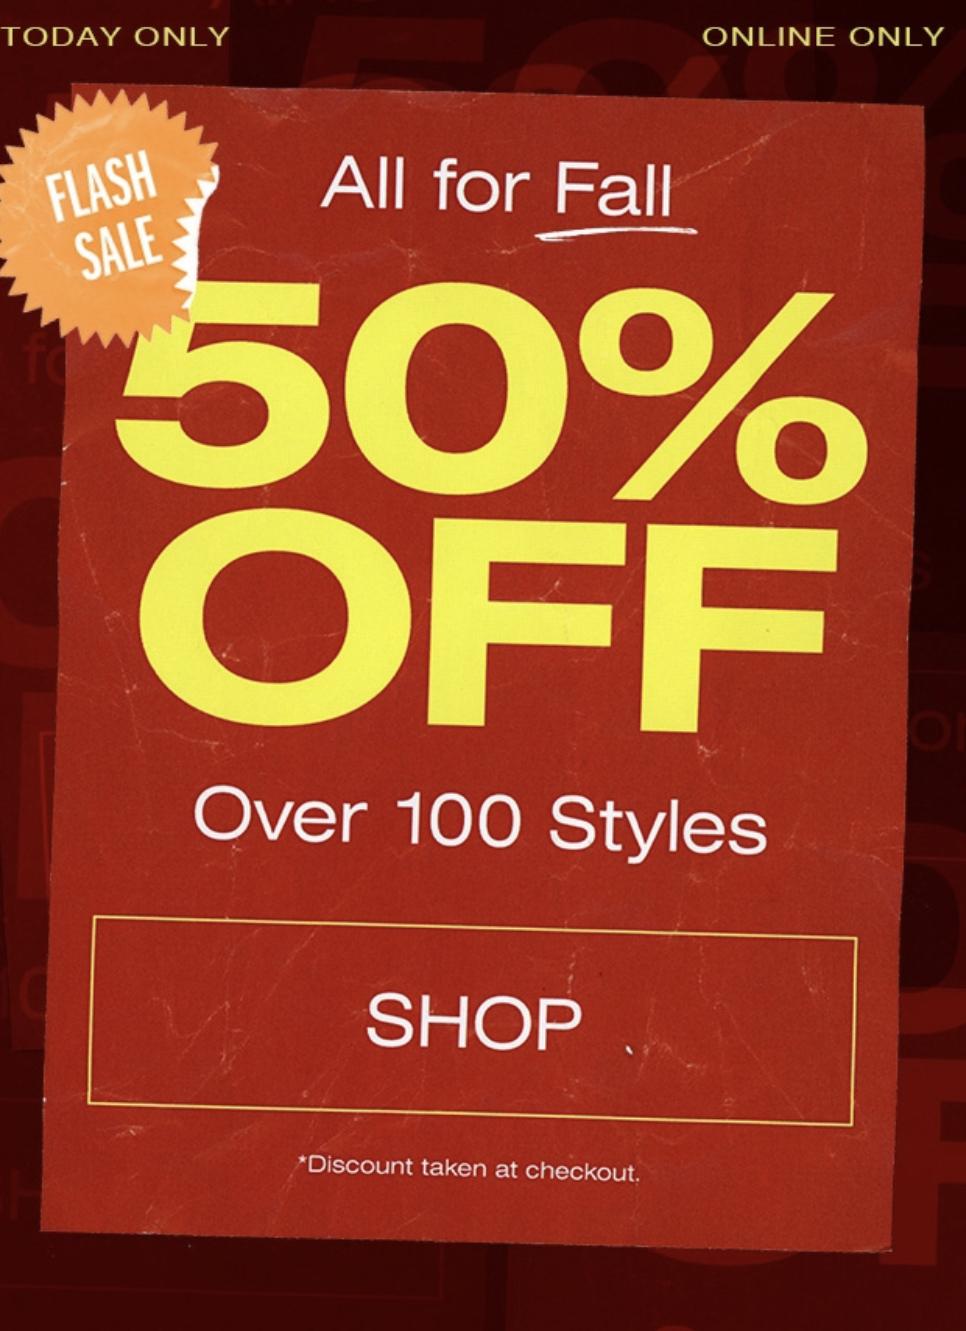 ba7582aac01a Flash Sale: 50% OFF 100+ Select Items — Sneaker Shouts